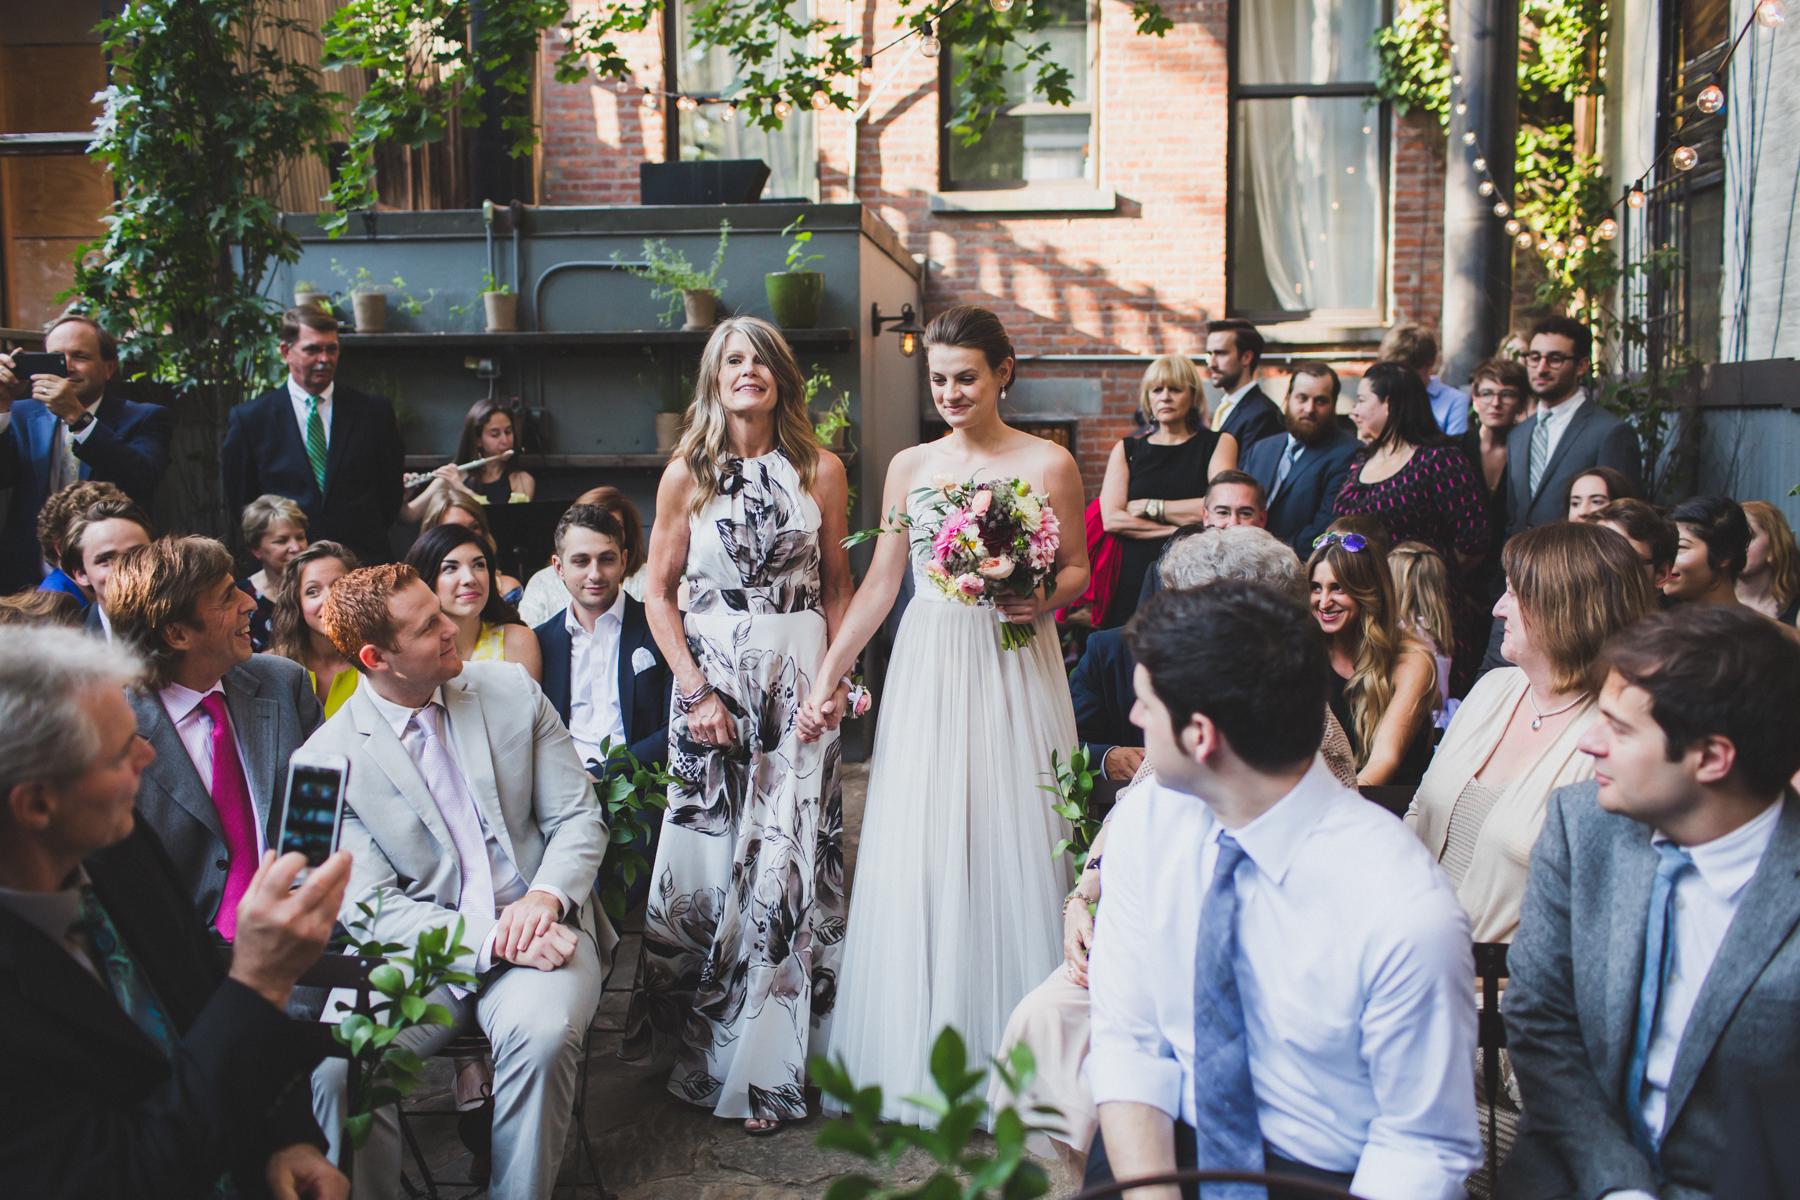 ICI-Restaurant-Fort-Greene-Brooklyn-Intimate-Documentary-Wedding-Photography-Elvira-Kalviste-31.jpg